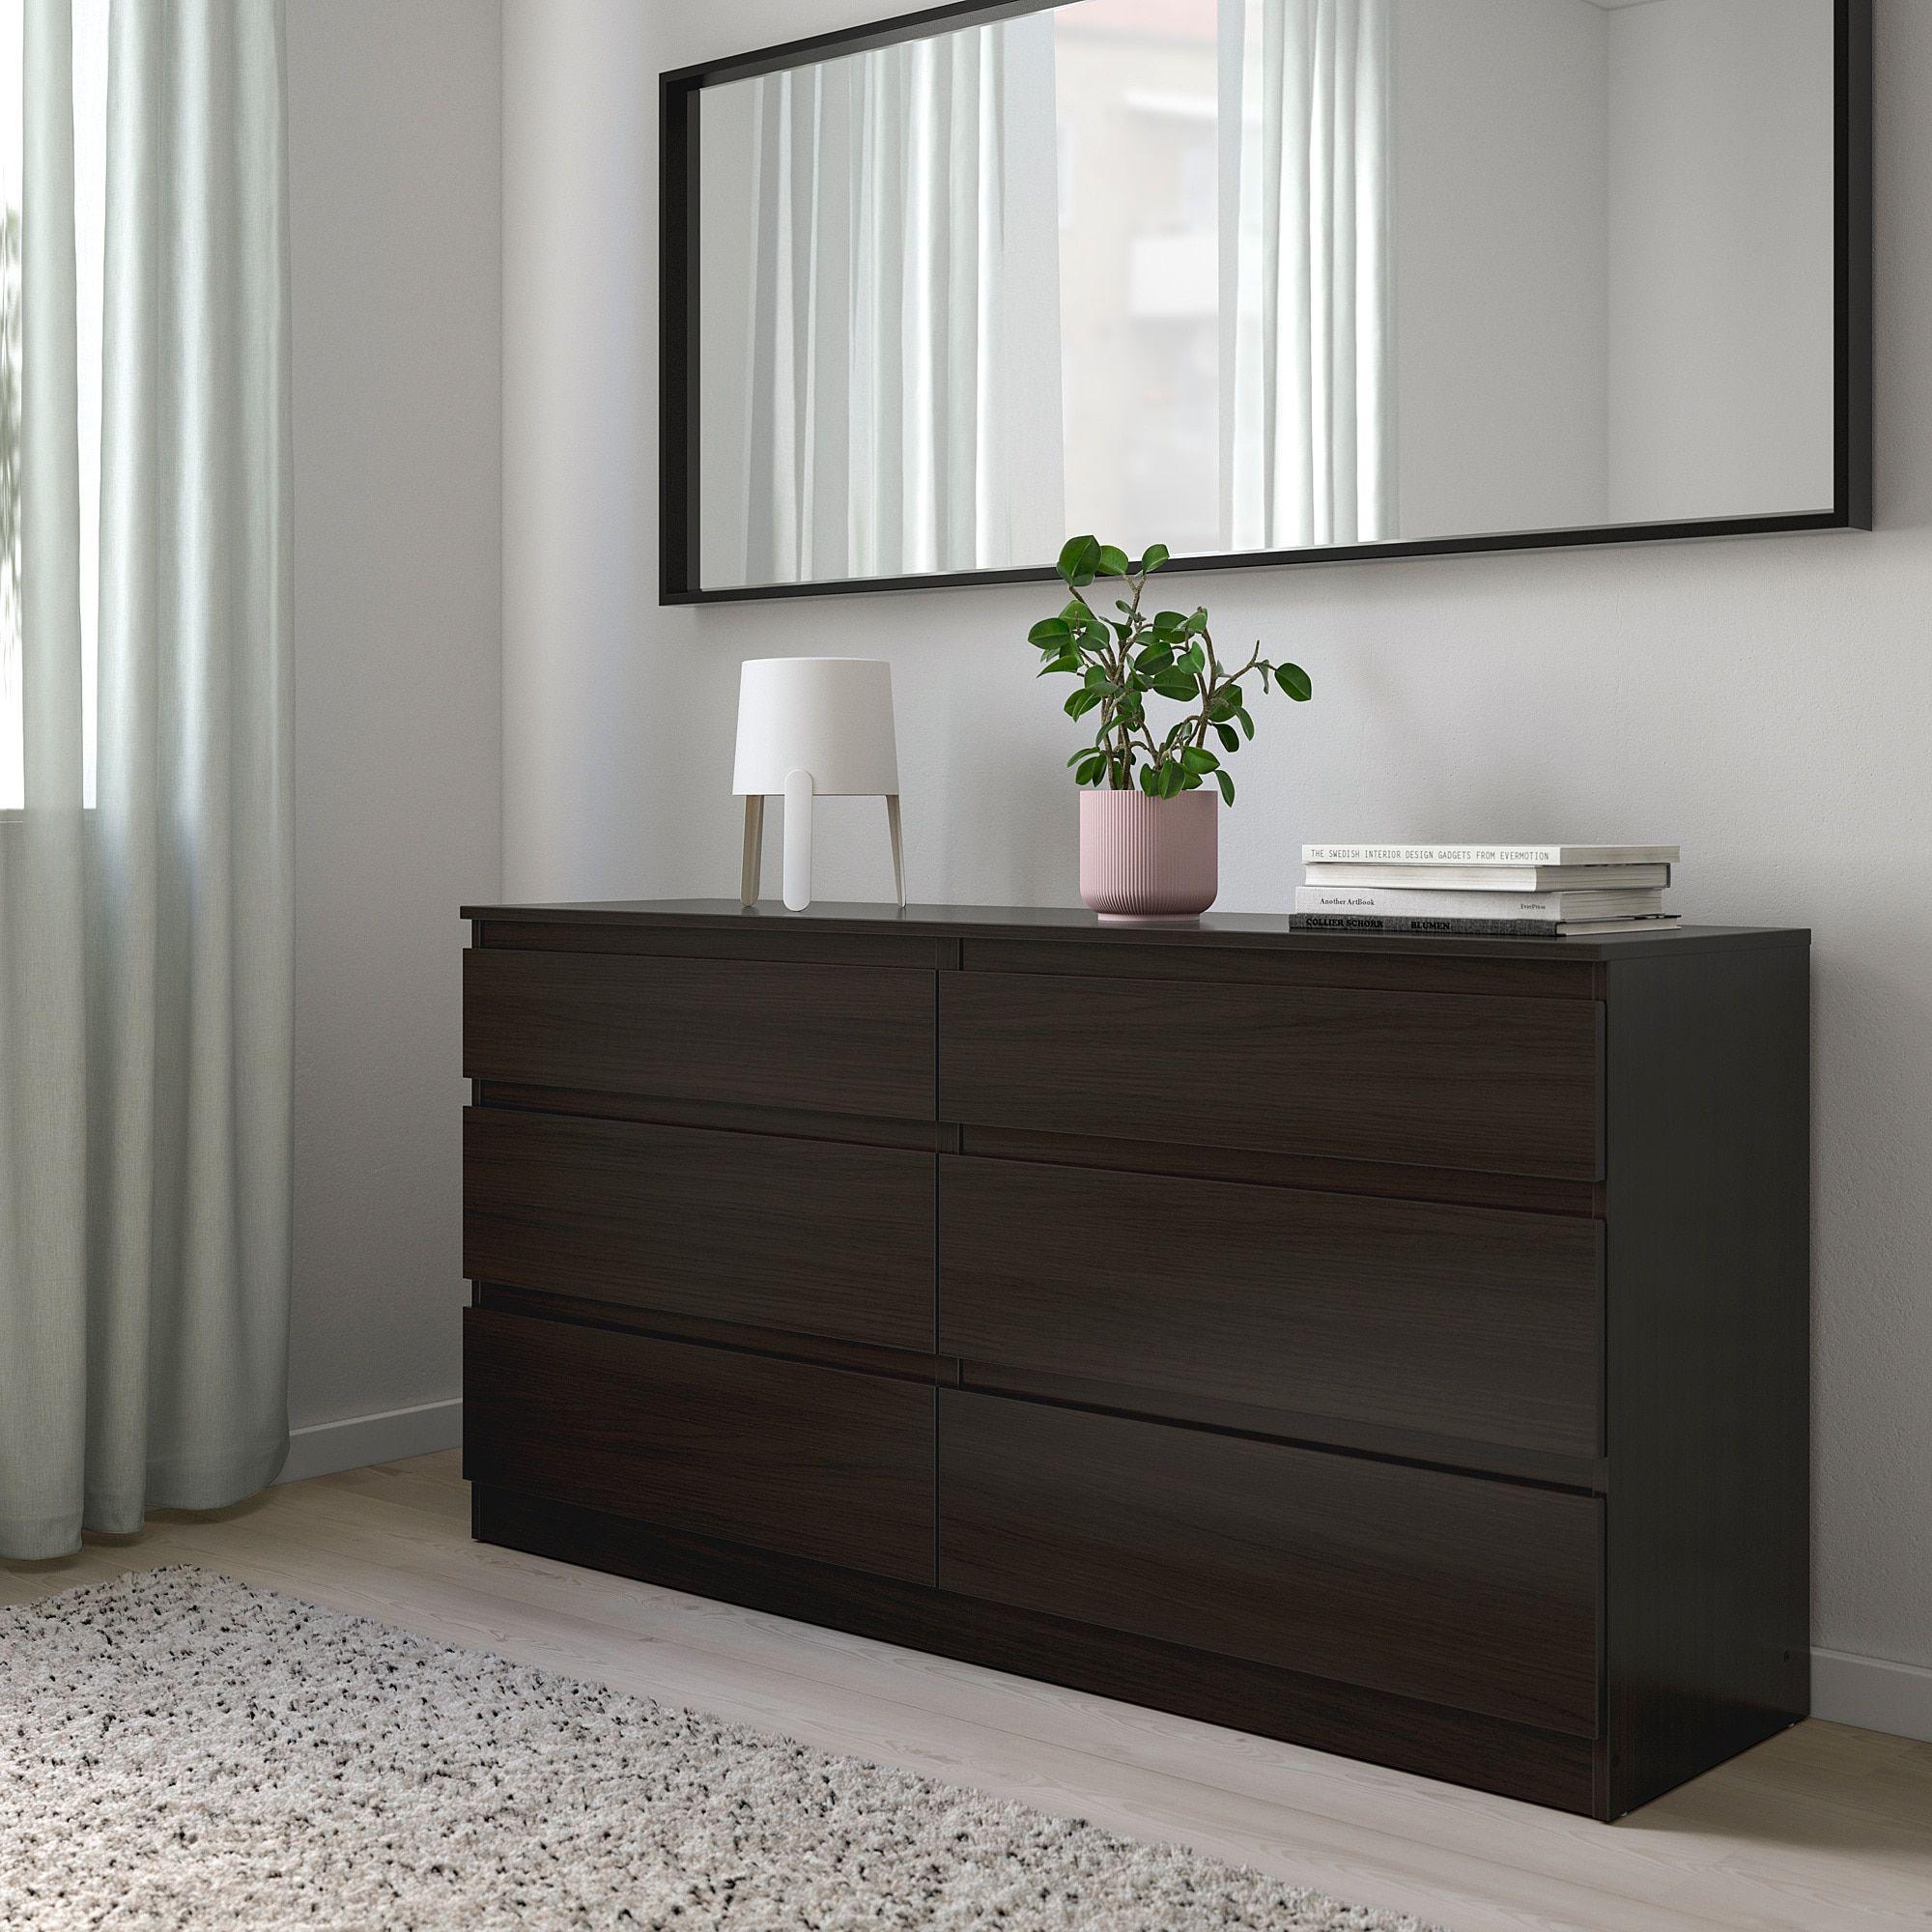 Ikea Kullen 6 Drawer Dresser Black Brown 6 Drawer Dresser